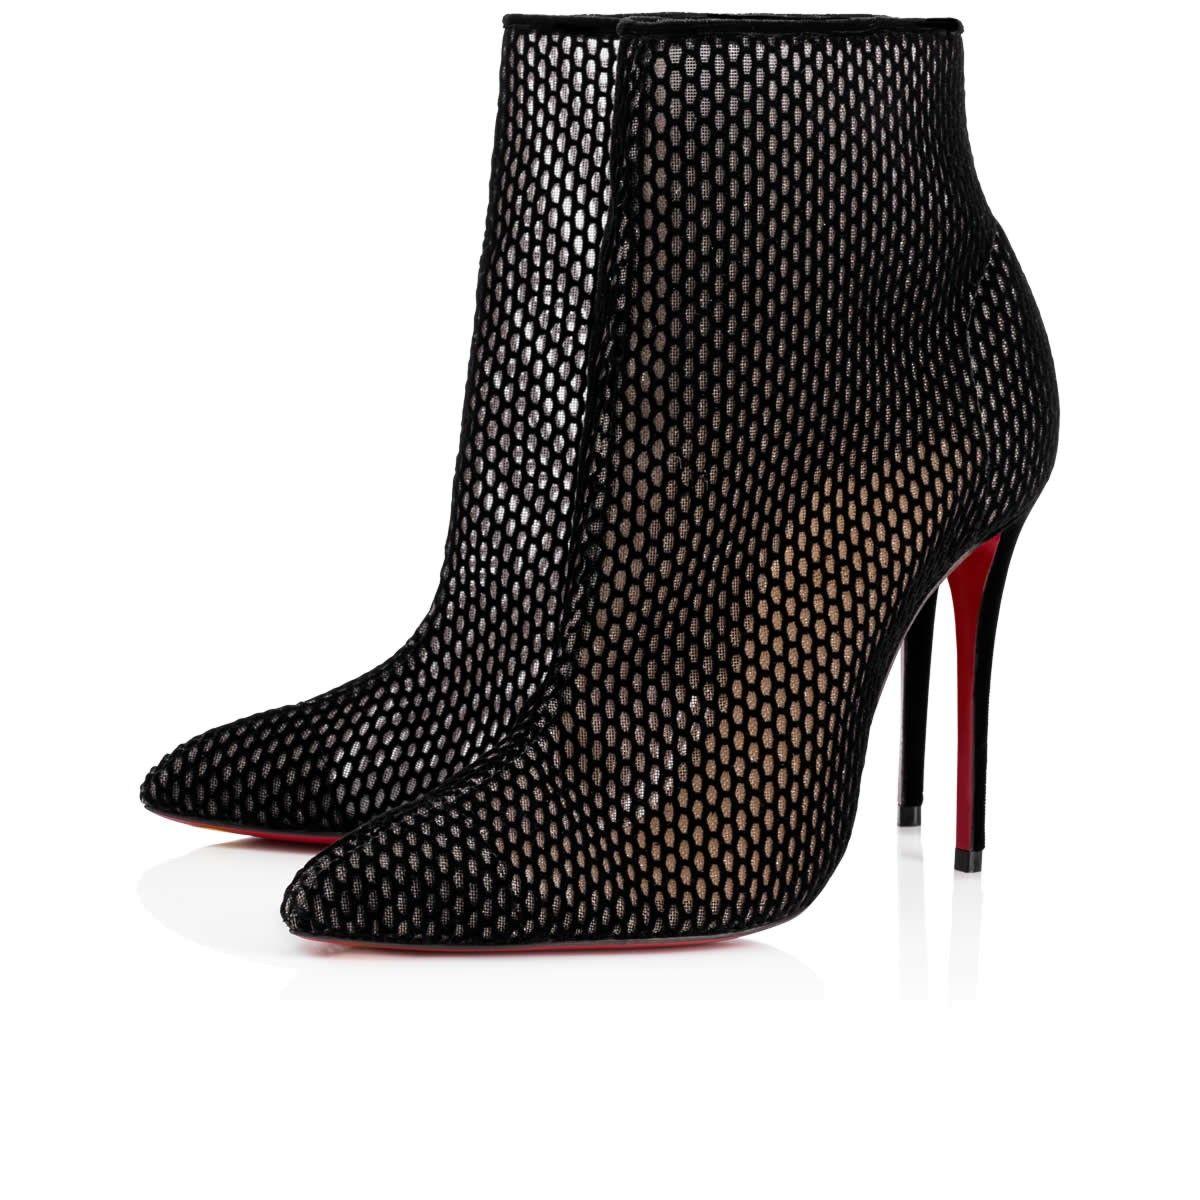 9c4e7dd50339 CHRISTIAN LOUBOUTIN Gipsybootie. #christianlouboutin #shoes ...